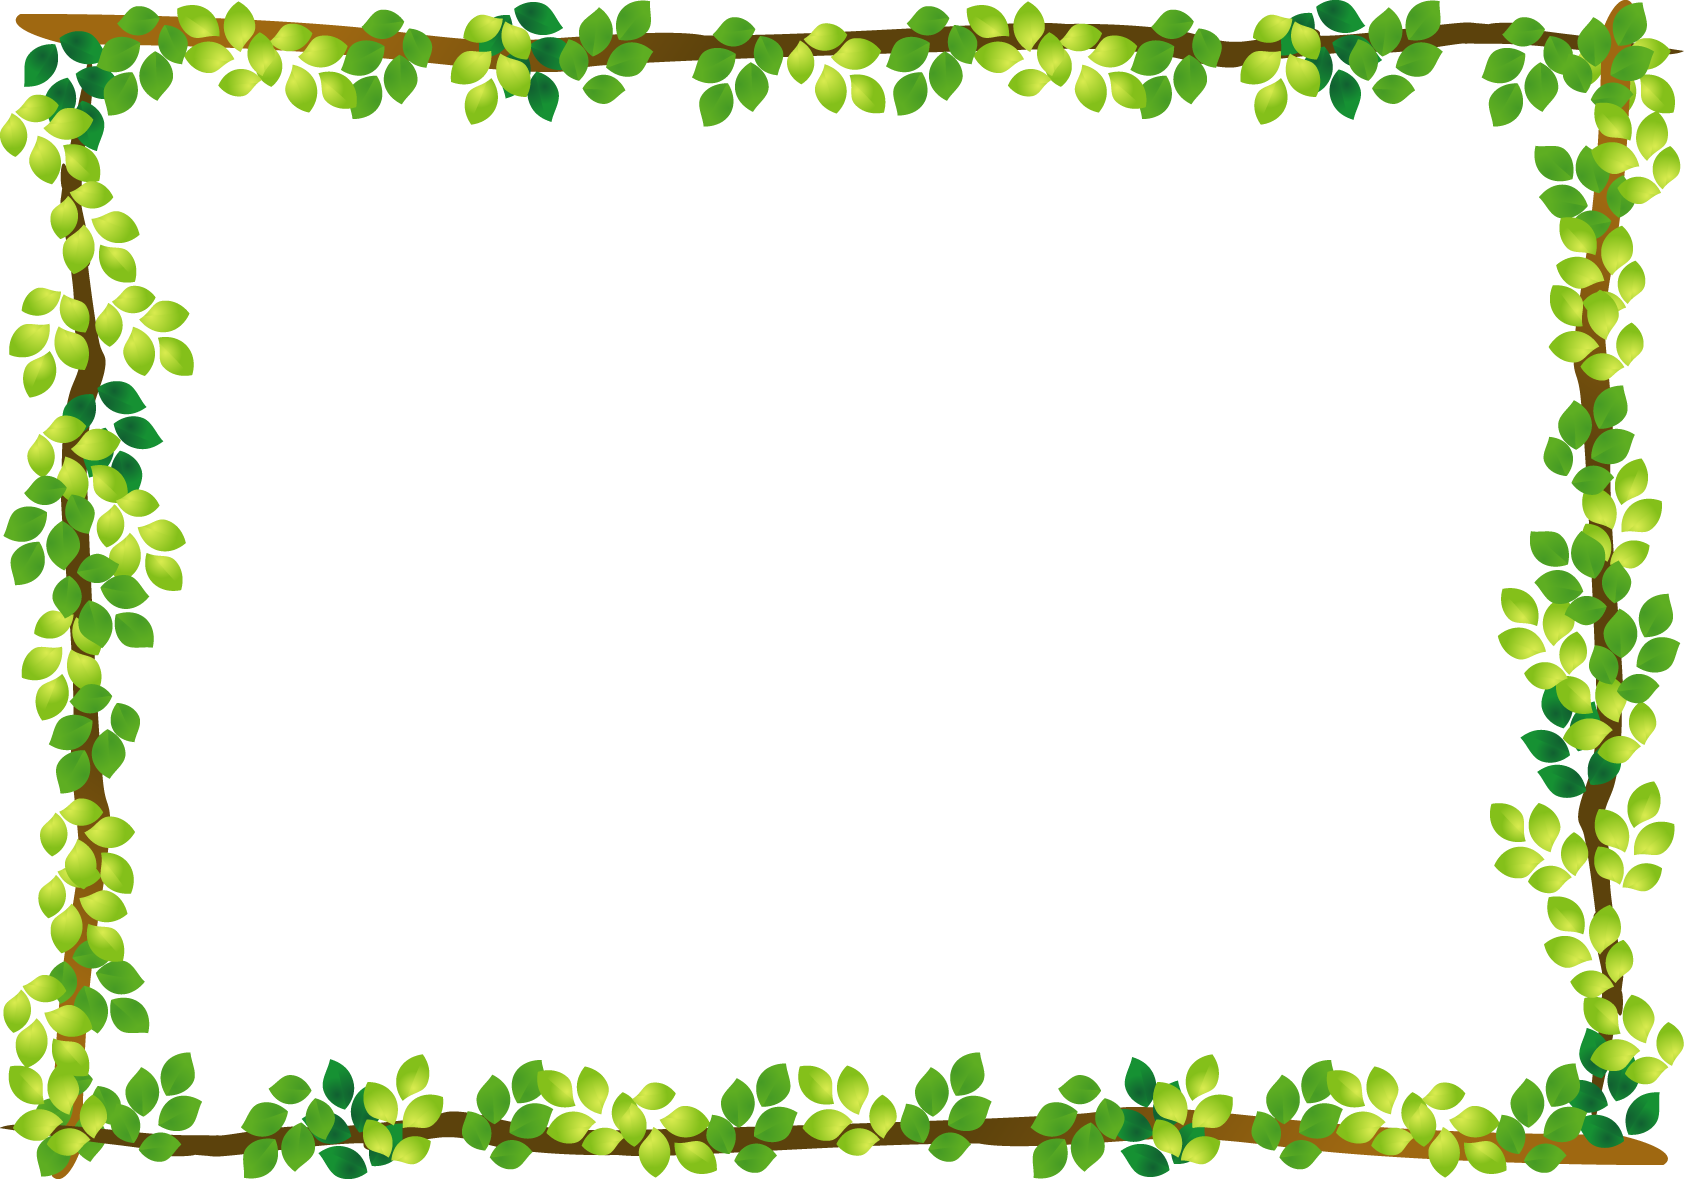 http://yoshie.bz/sampl/flower/green/f02 | ramar ( frame